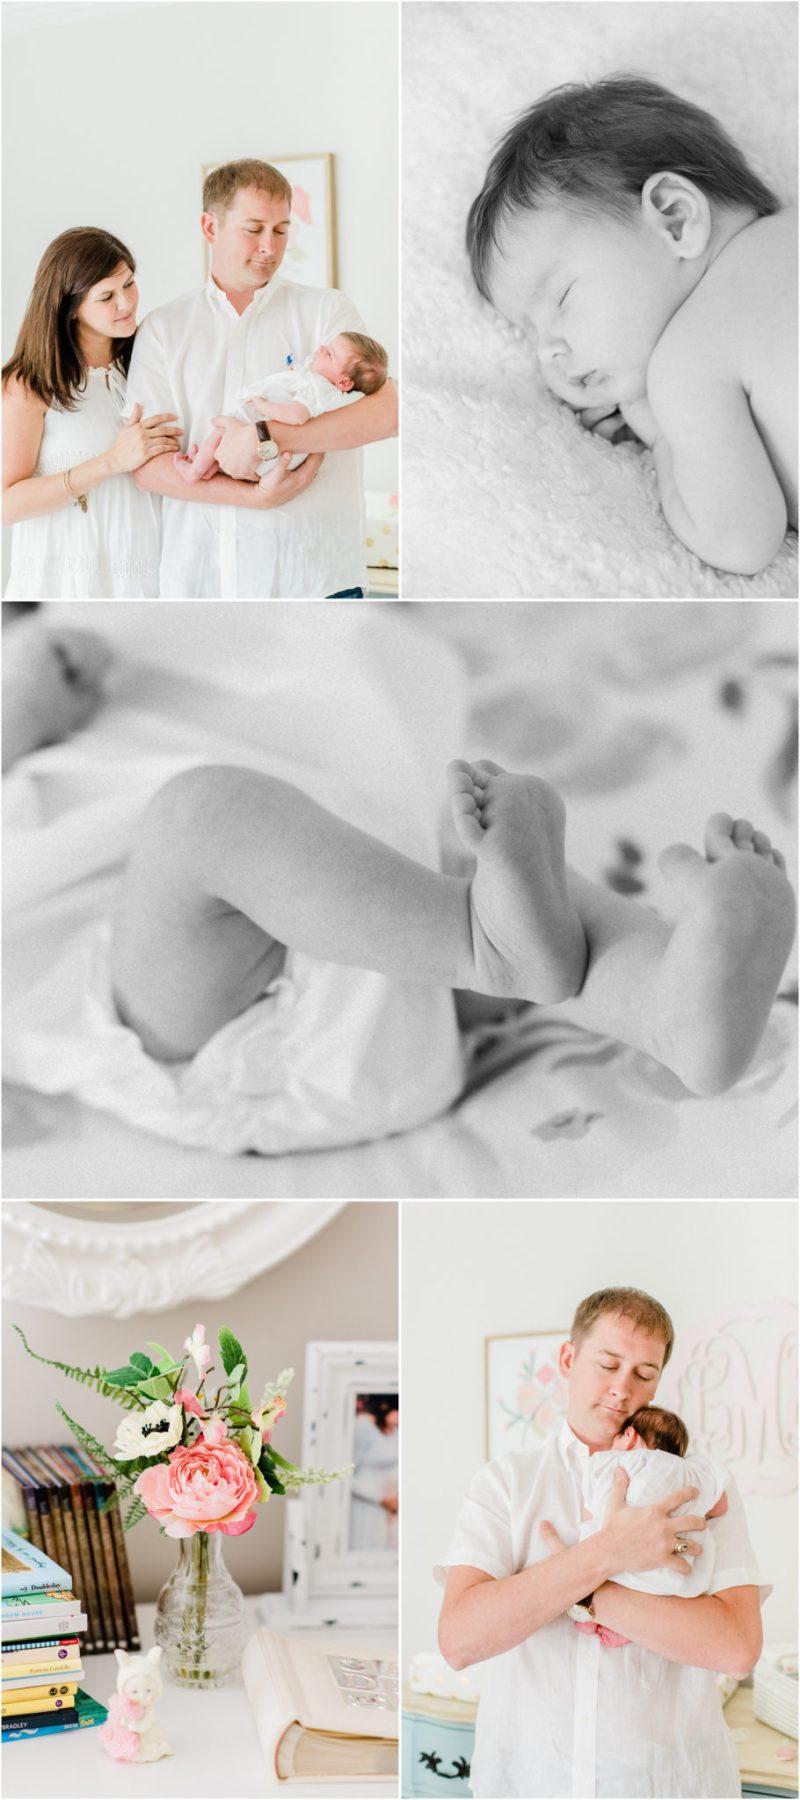 South Carolina in home Clemson newborn session | In home Clemson newborn session | Clemson Newborn Photographer